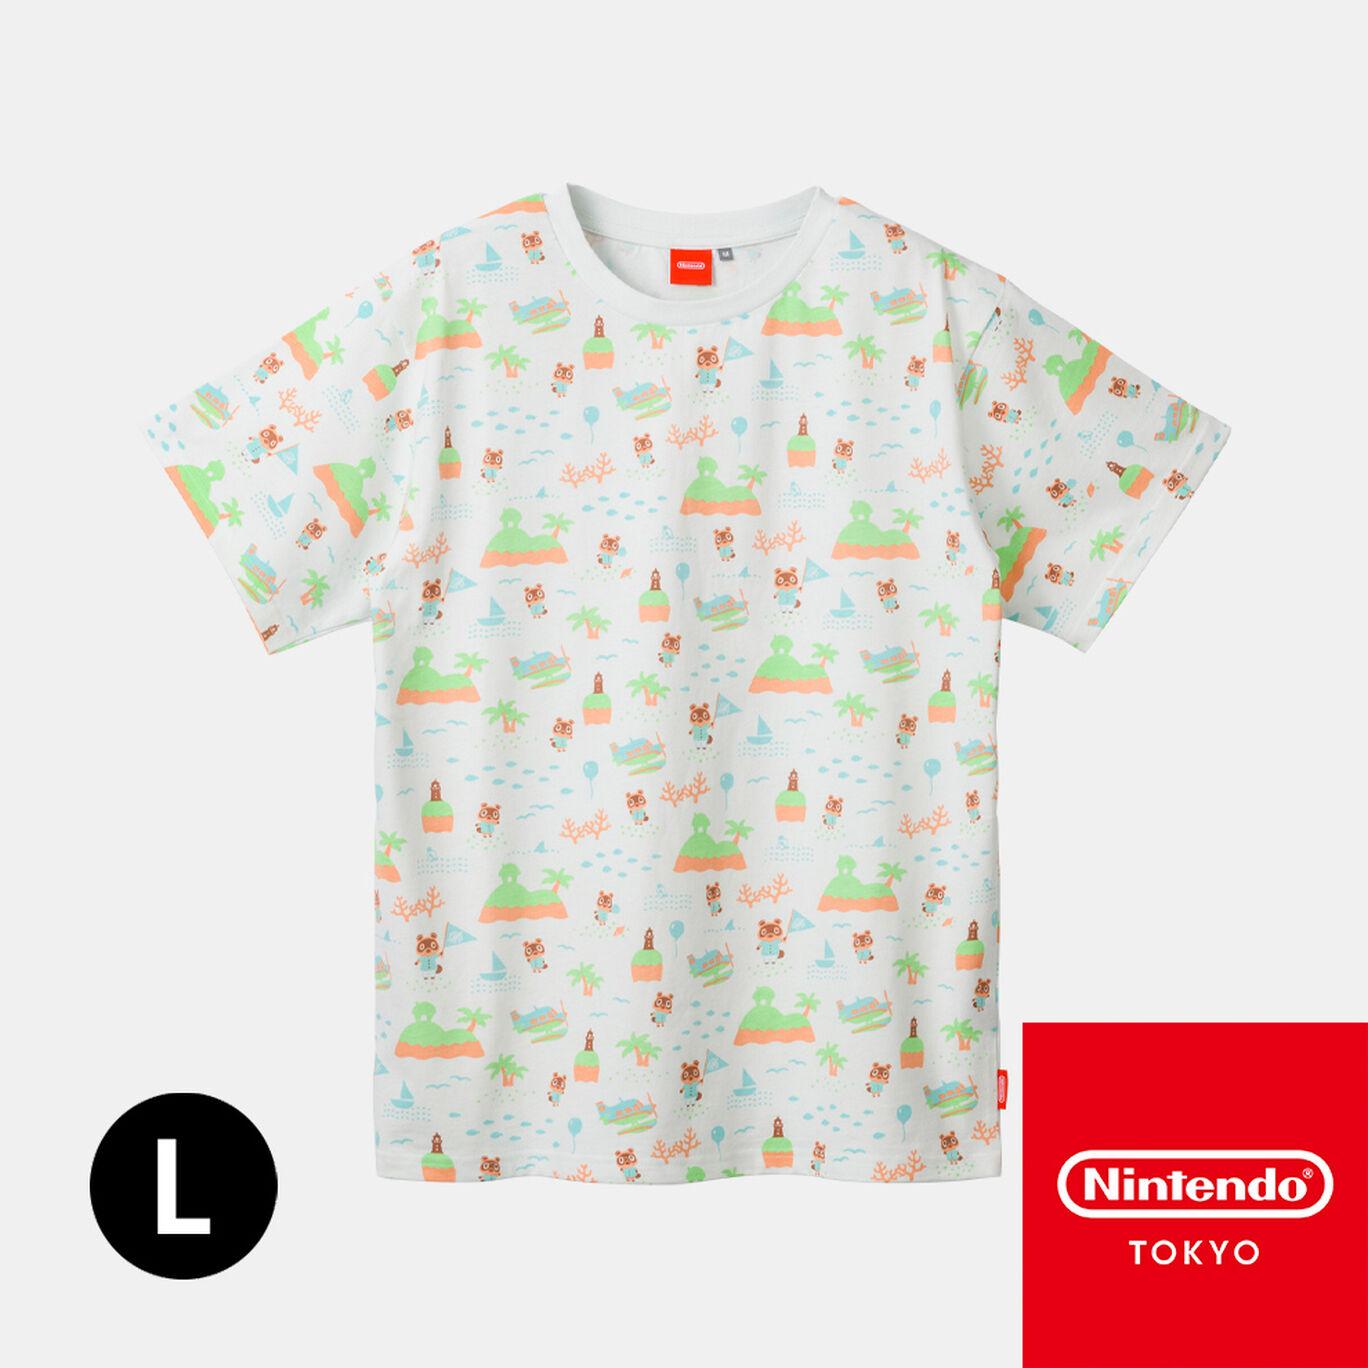 TシャツB L あつまれ どうぶつの森【Nintendo TOKYO取り扱い商品】